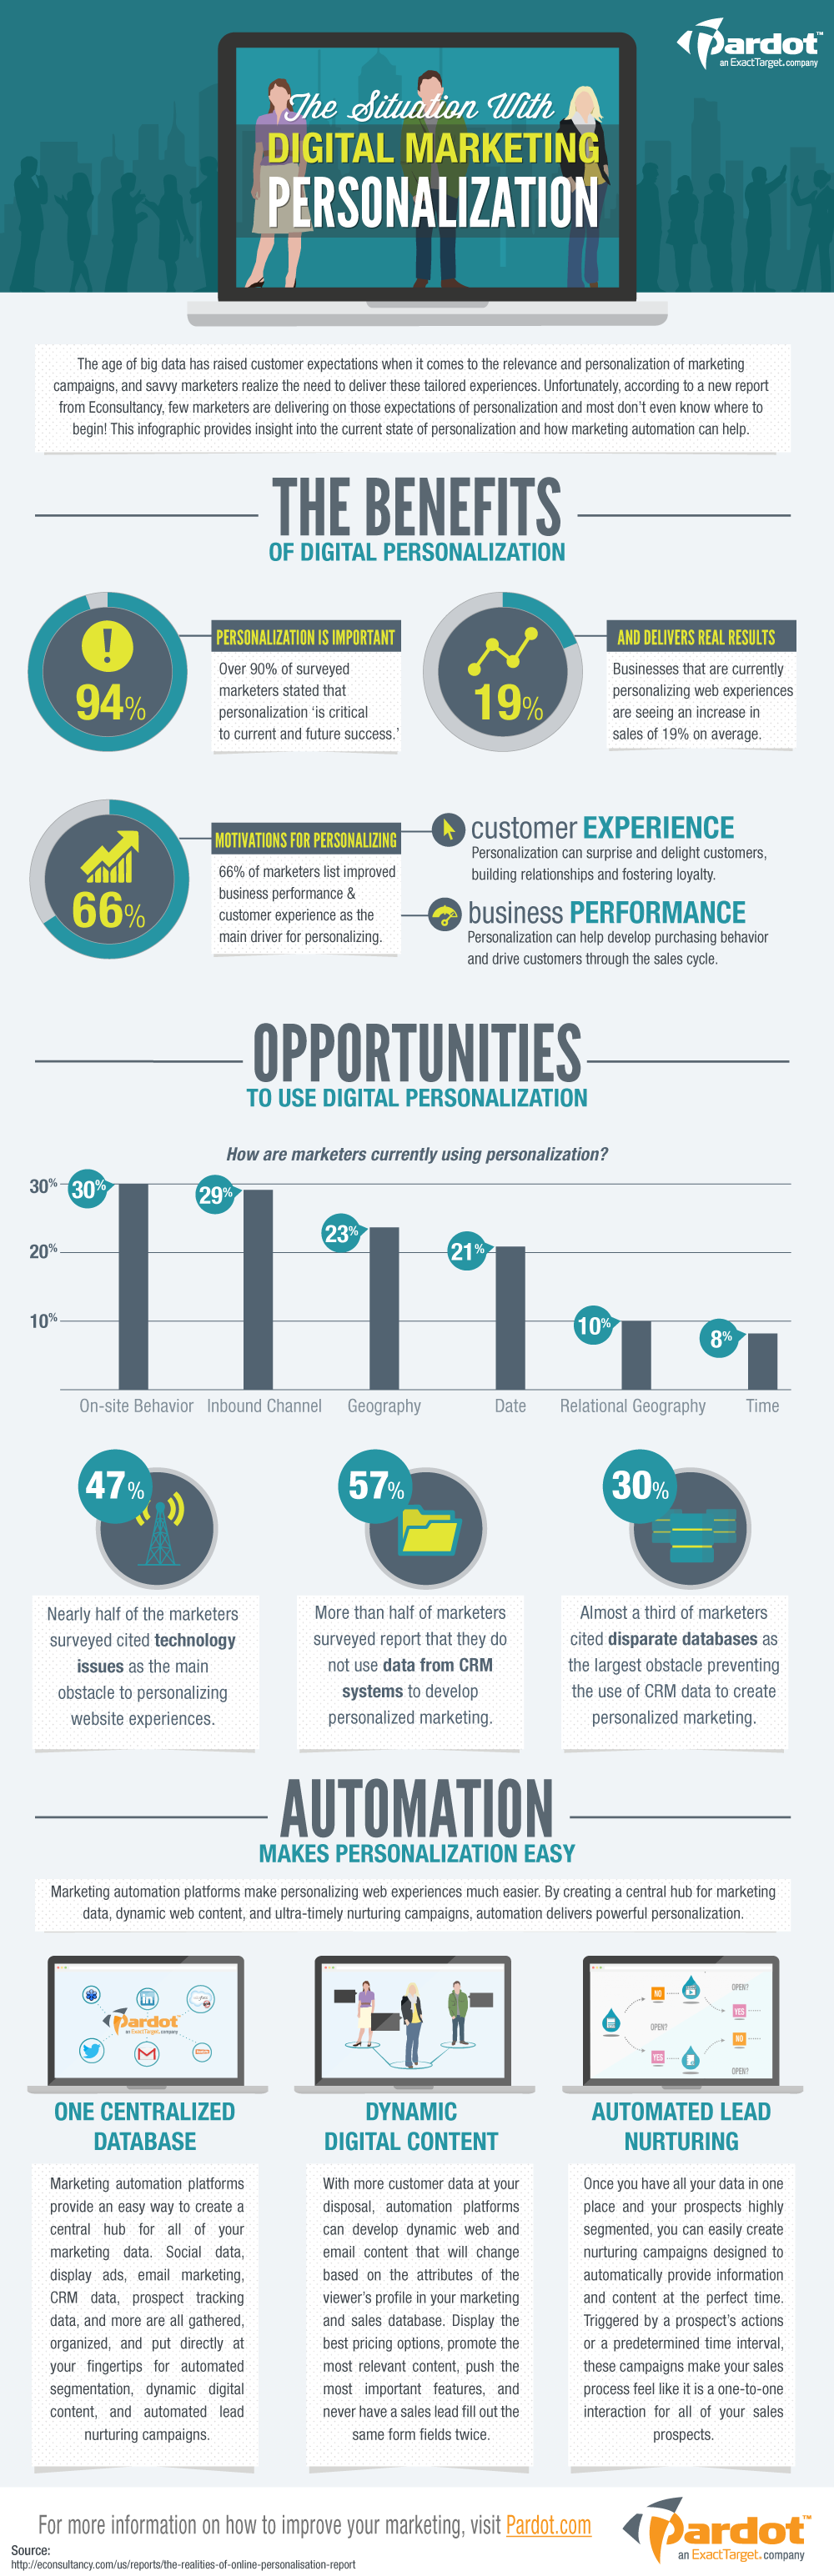 12. Personalization in Digital Marketing